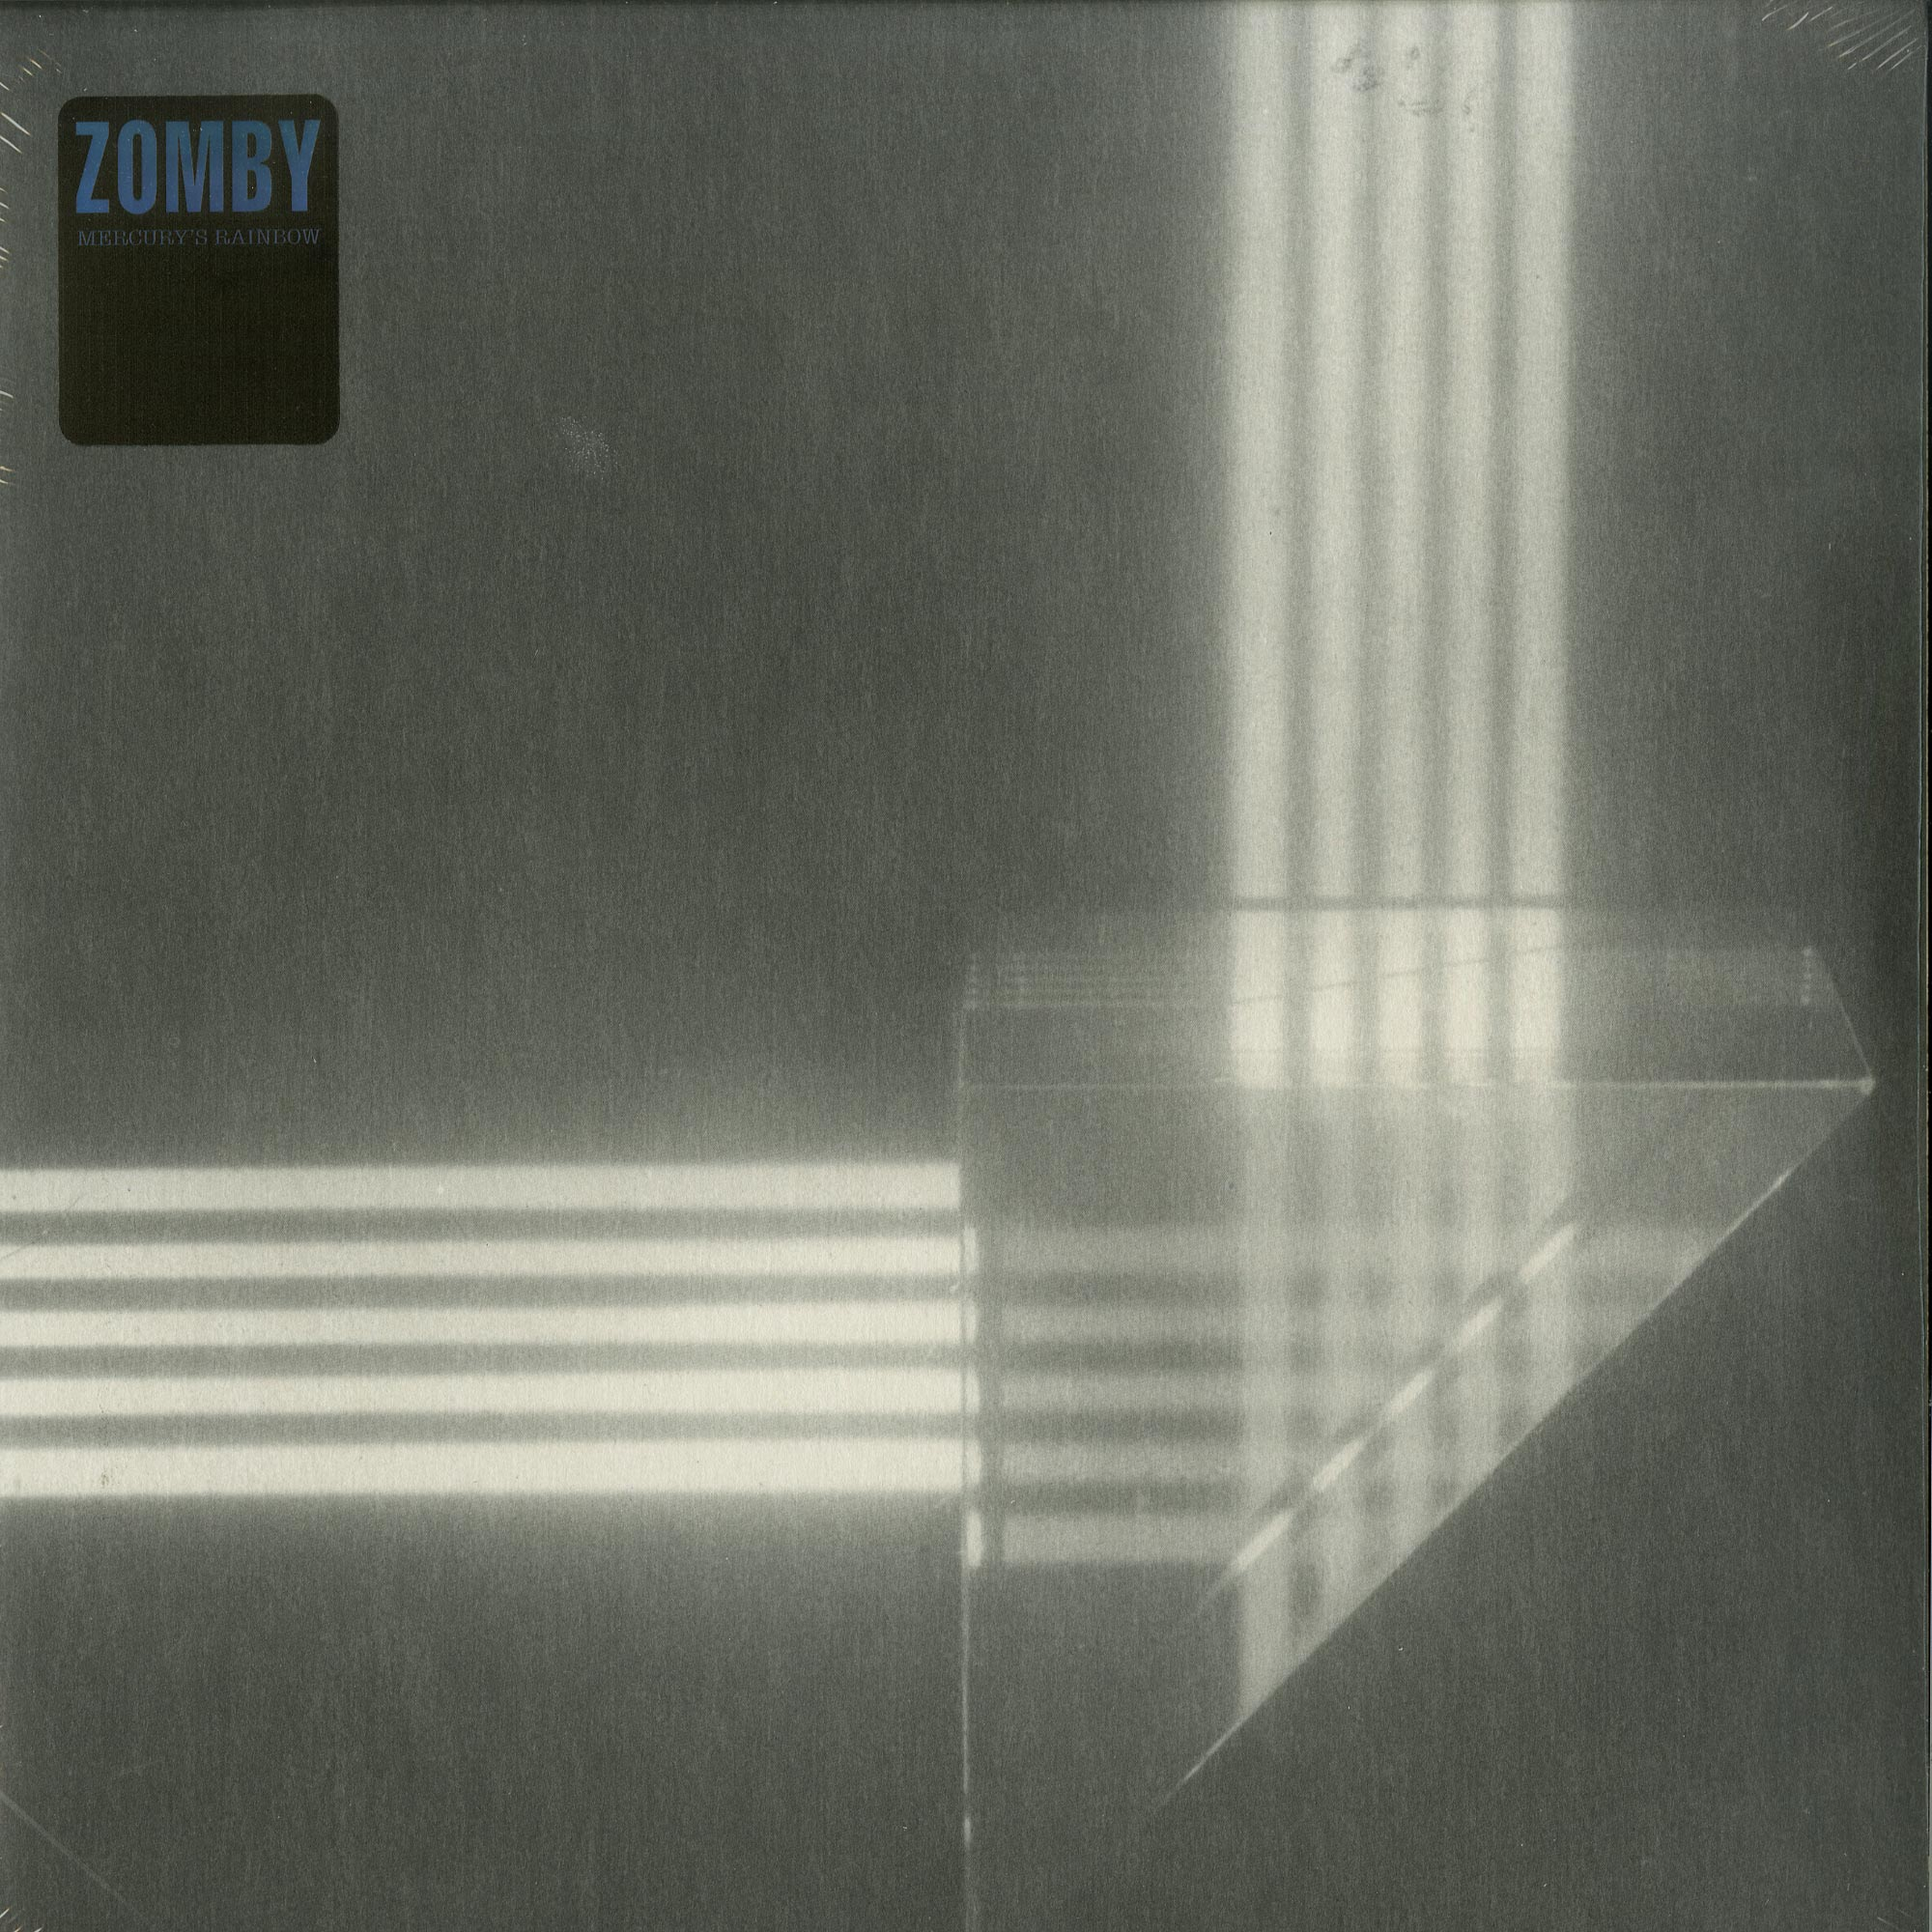 Zomby - Mercurys Rainbow